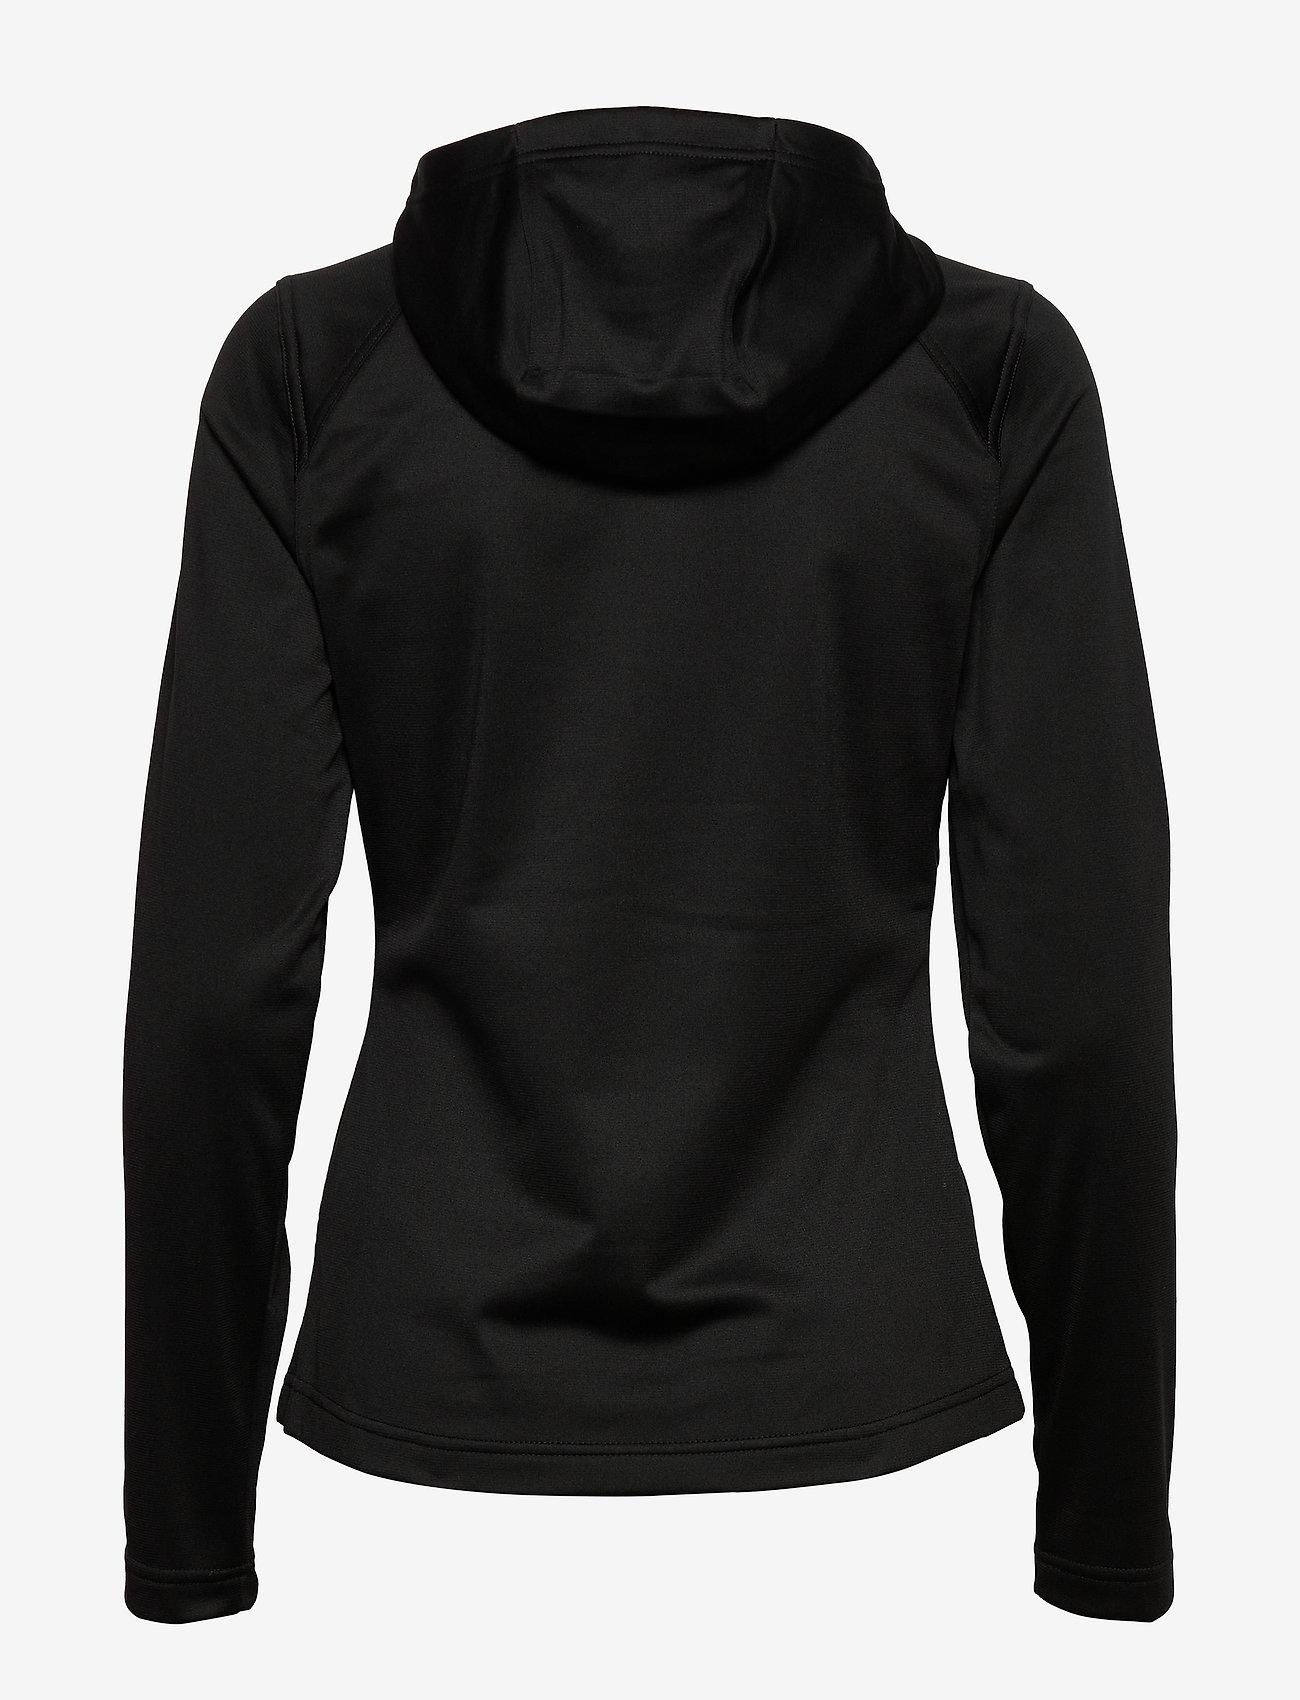 The North Face - W TECH MEZZALUNA HOODIE - EU - fleece - tnf black - 1